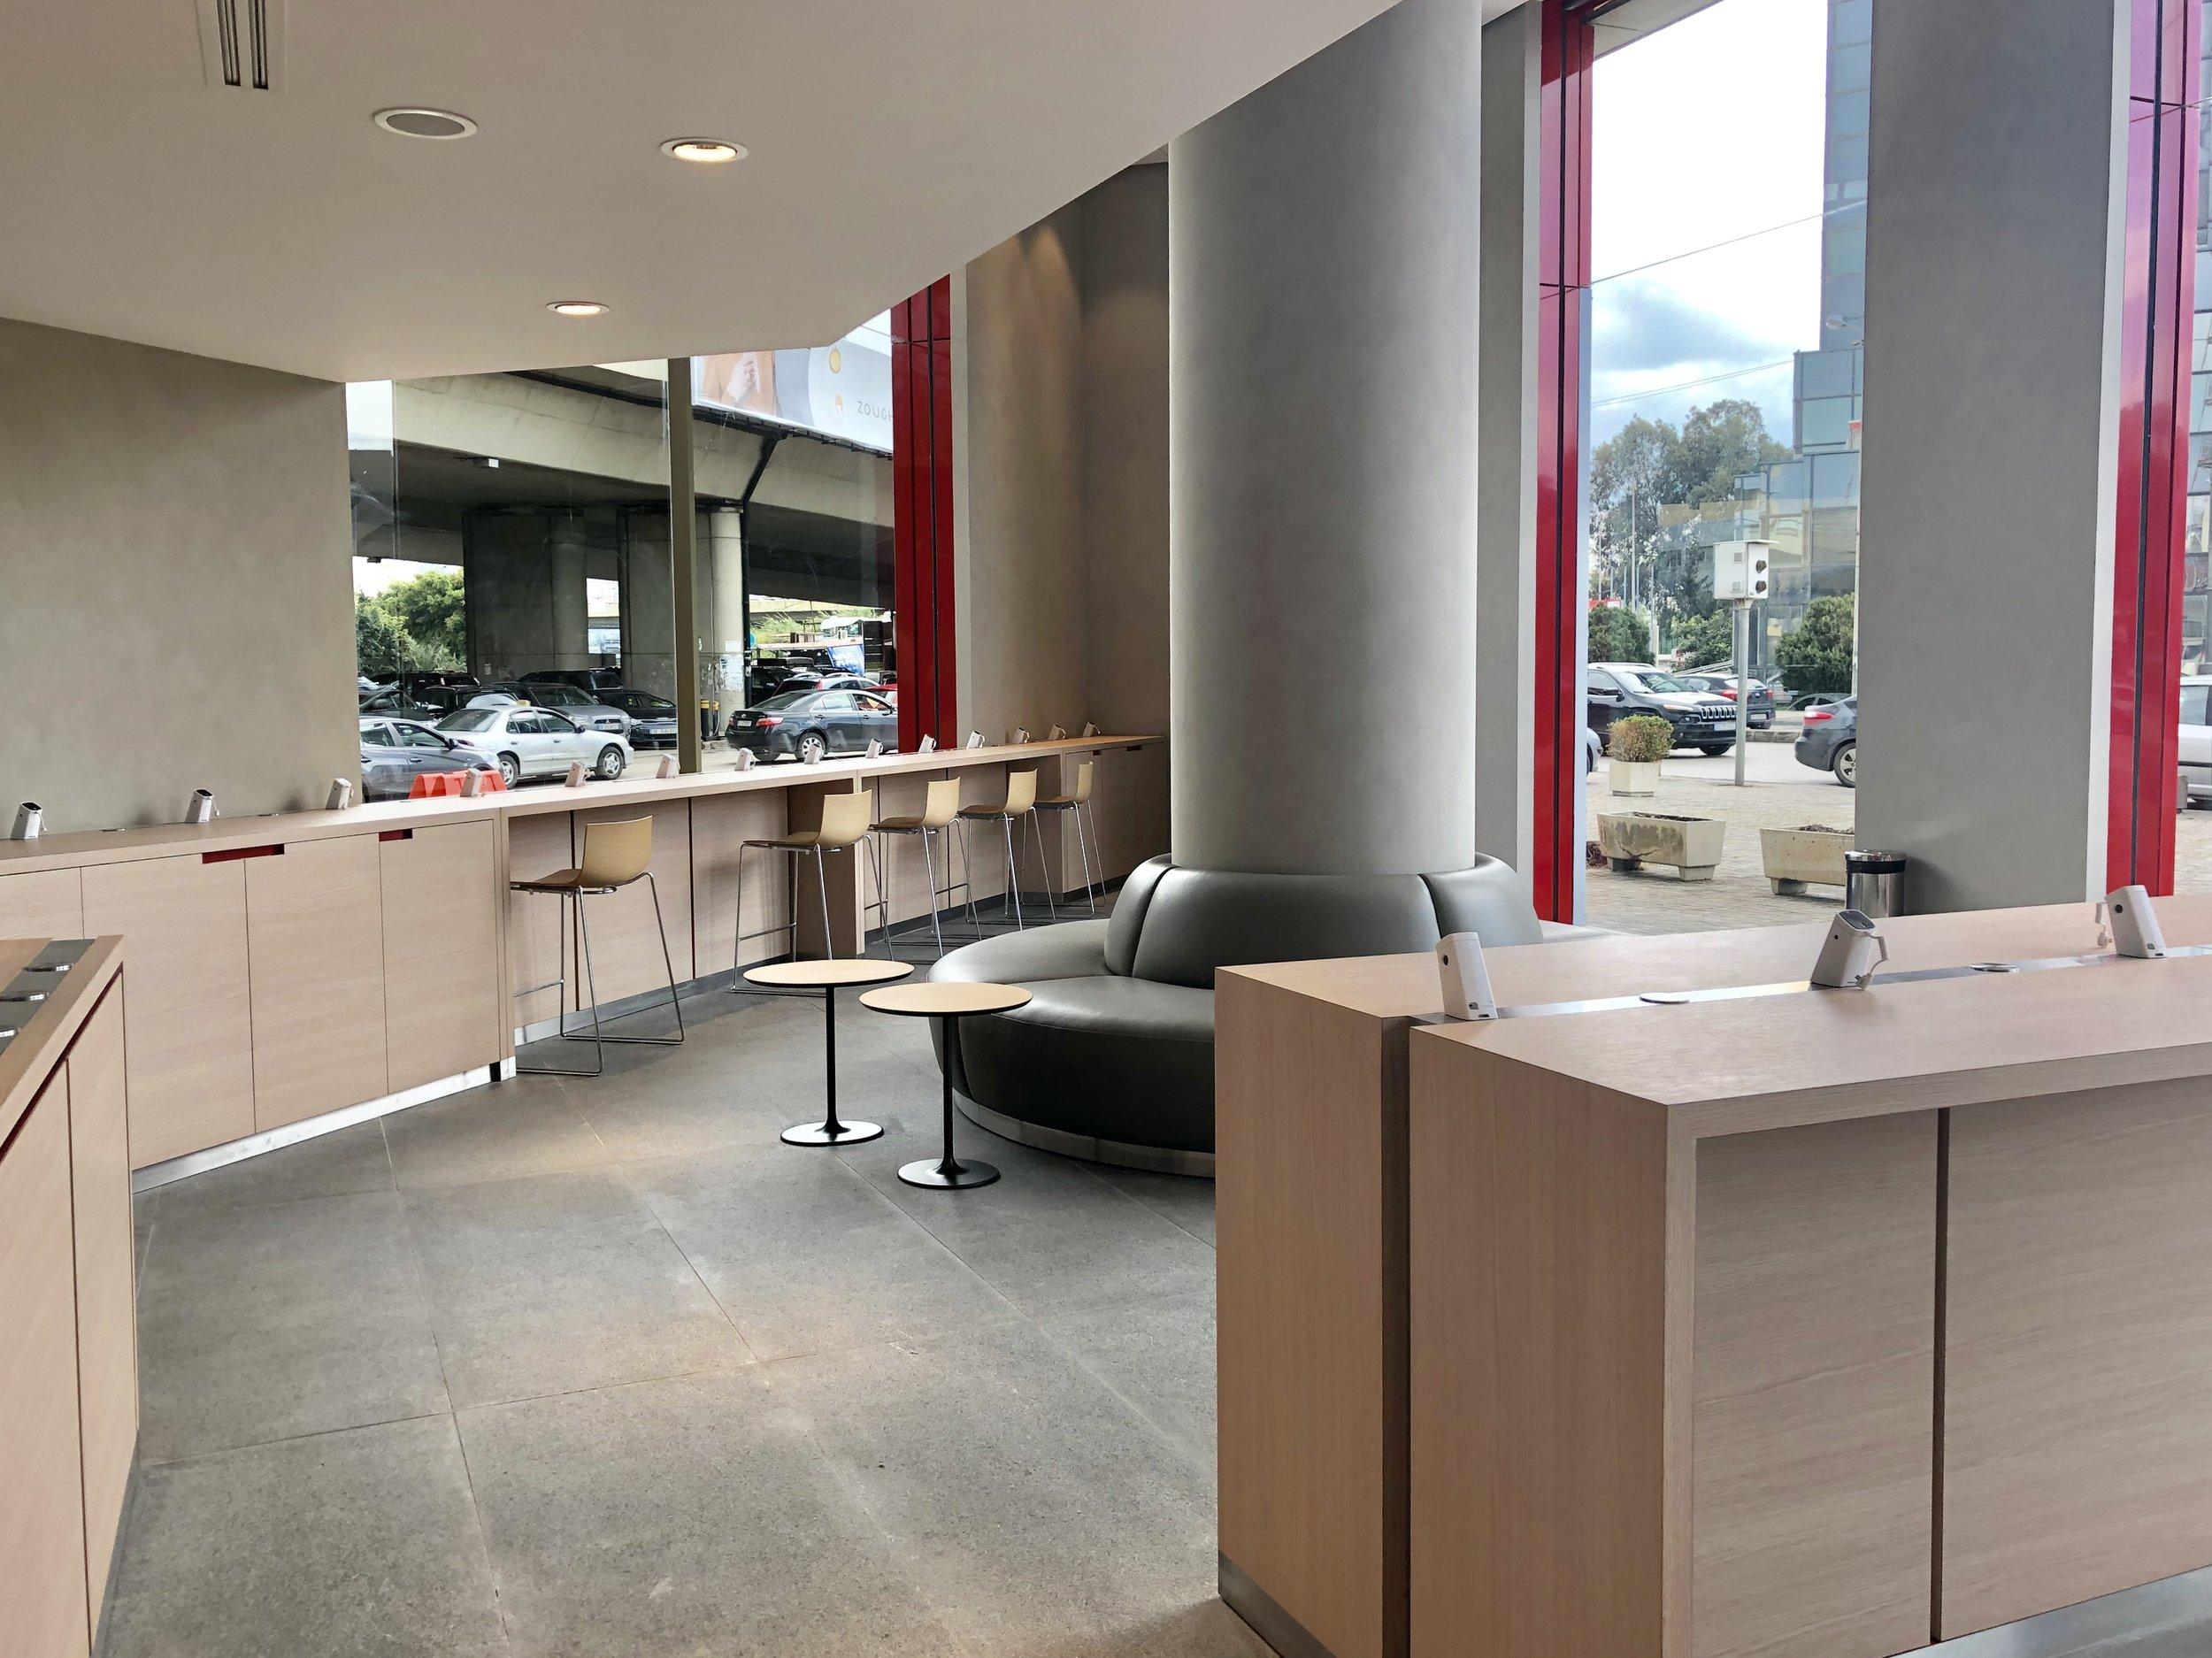 Alfa Store |  Ferdinand Djurovic | Sin El Fil, Lebanon